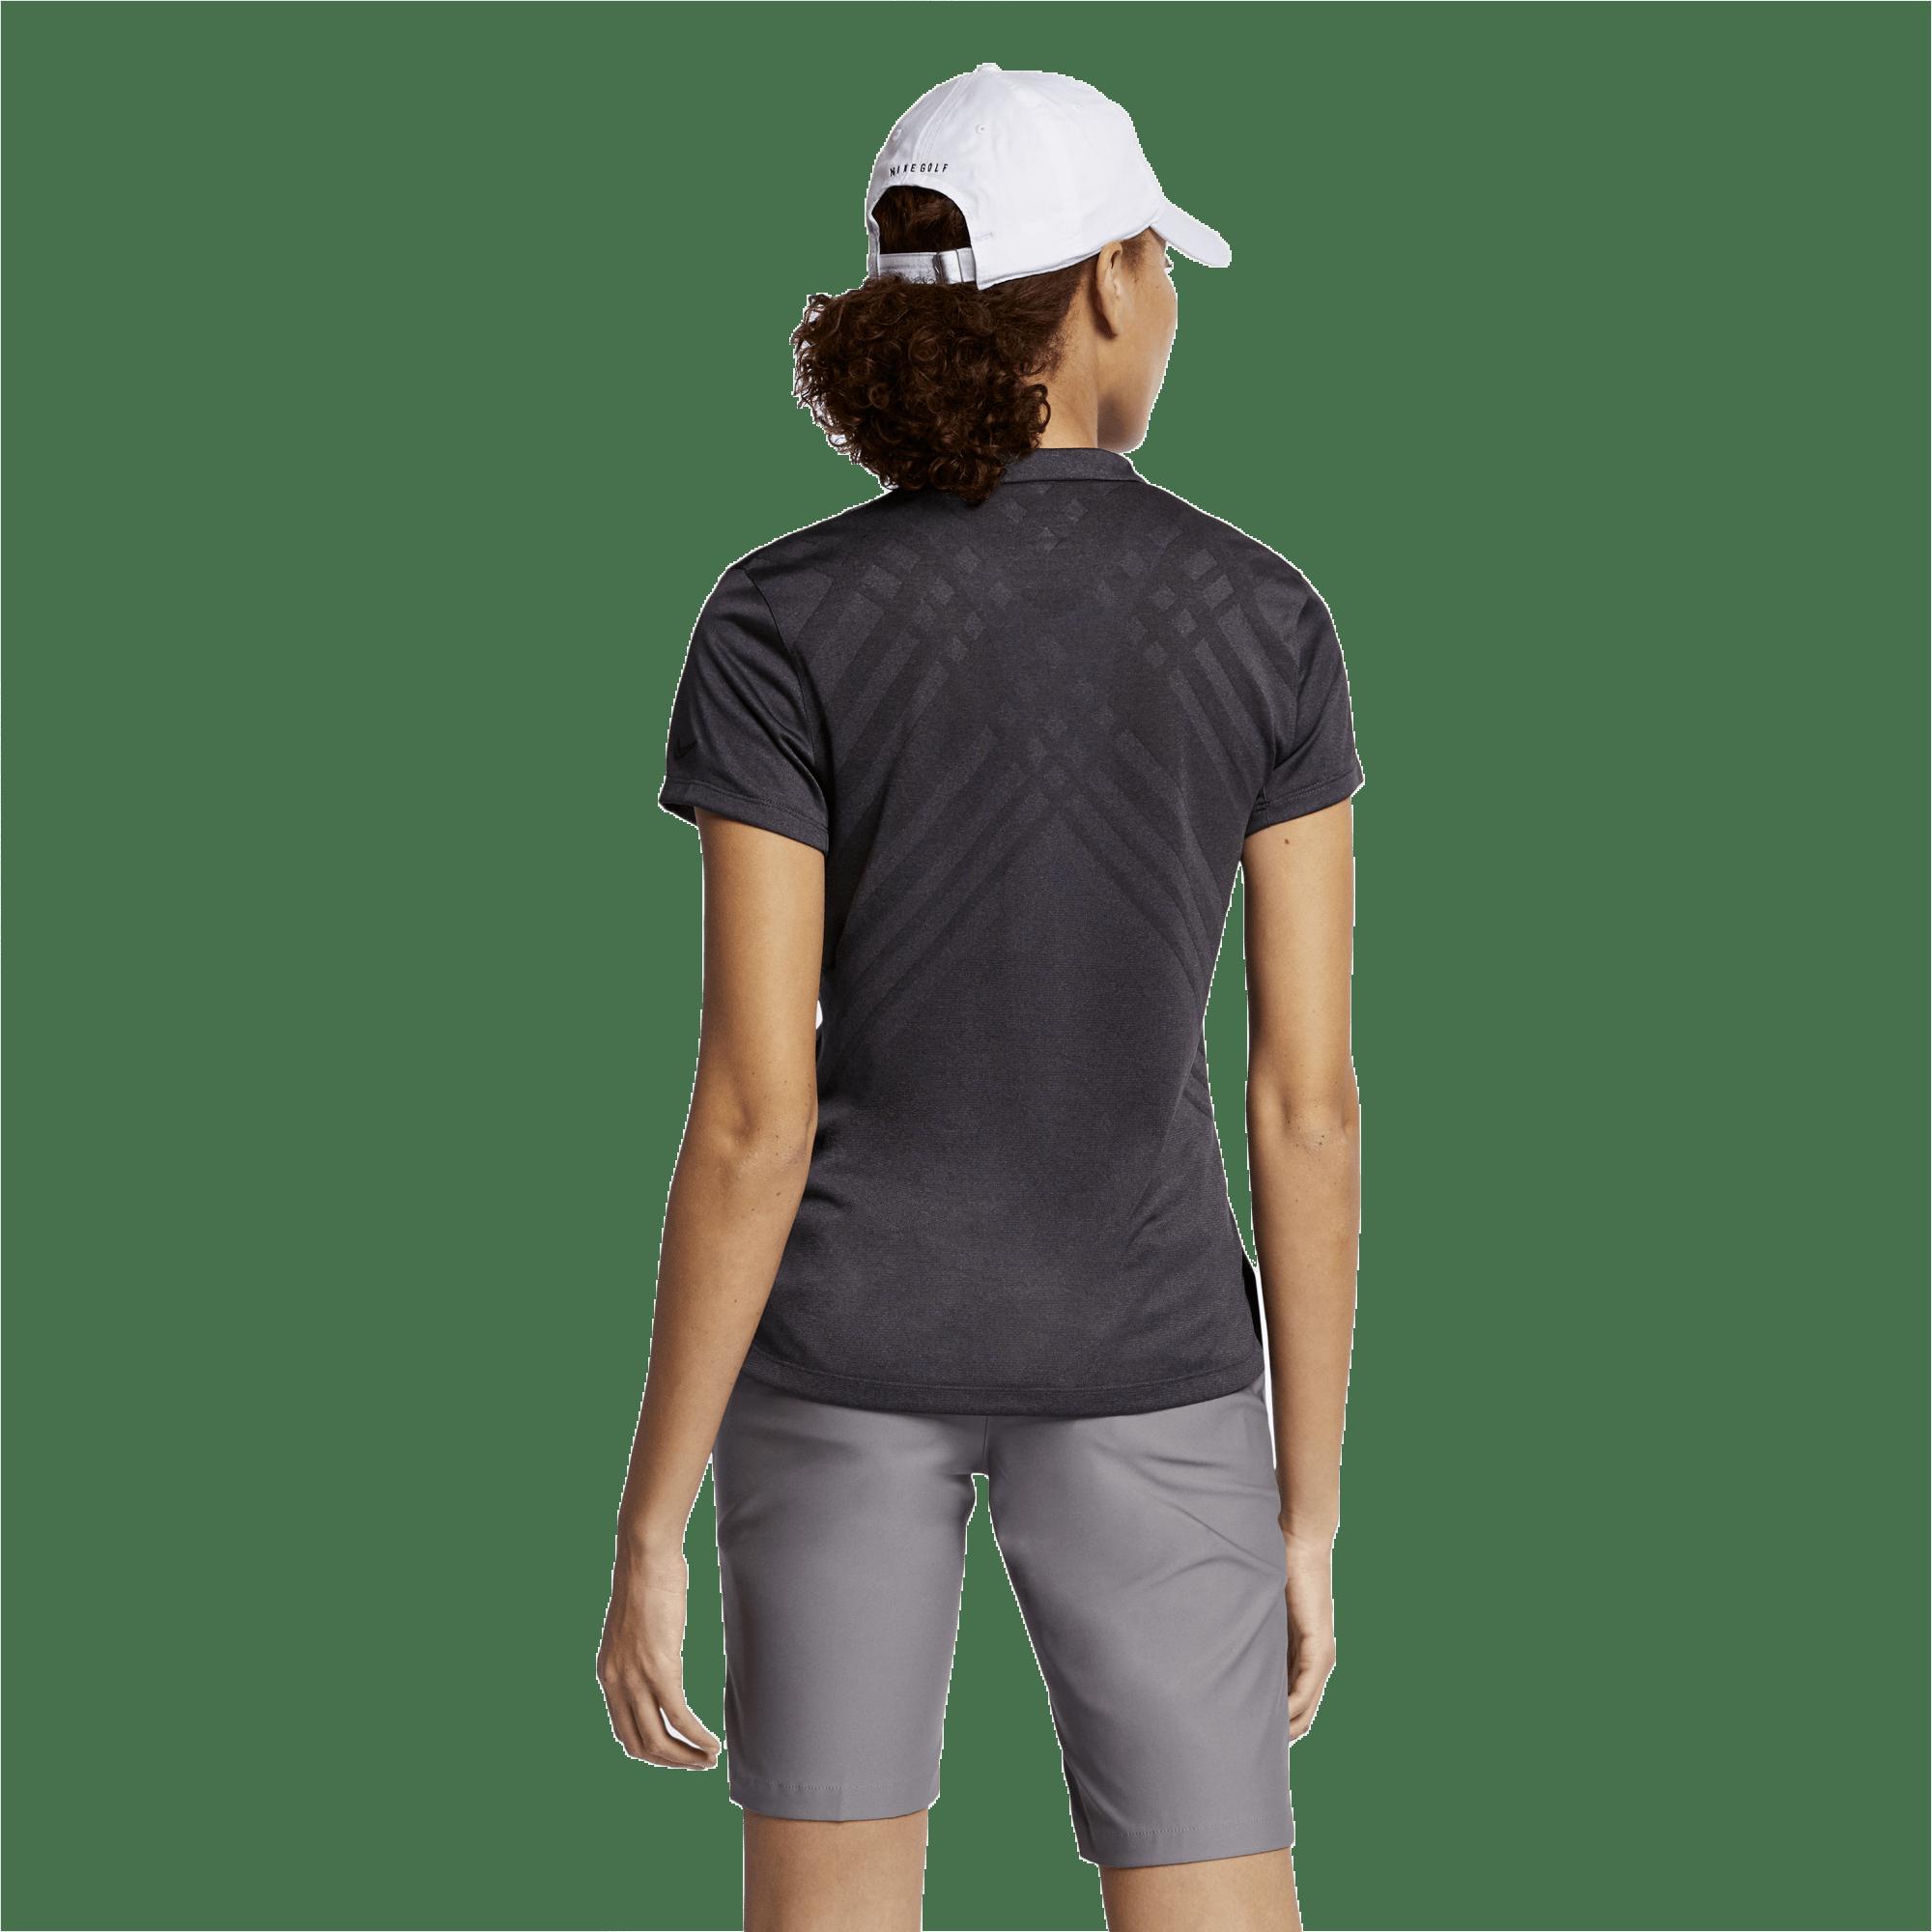 Nike TechKnit Cool Polo   PGA TOUR